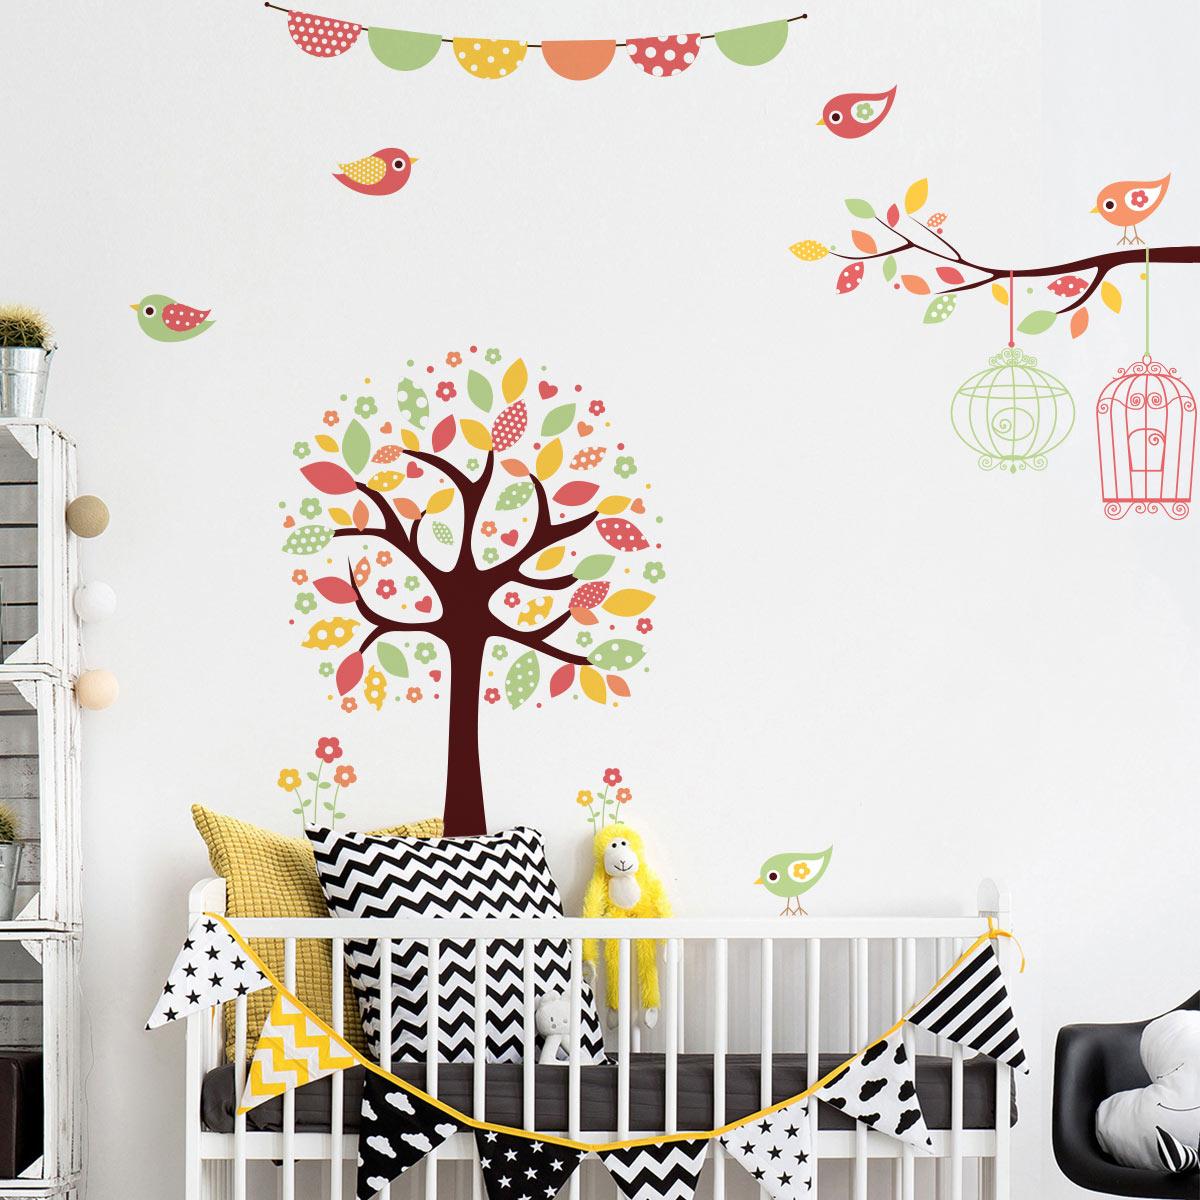 Arbre A Chat Mural Design https://www.ambiance-sticker/sticker-arbre-en-fleur-chat